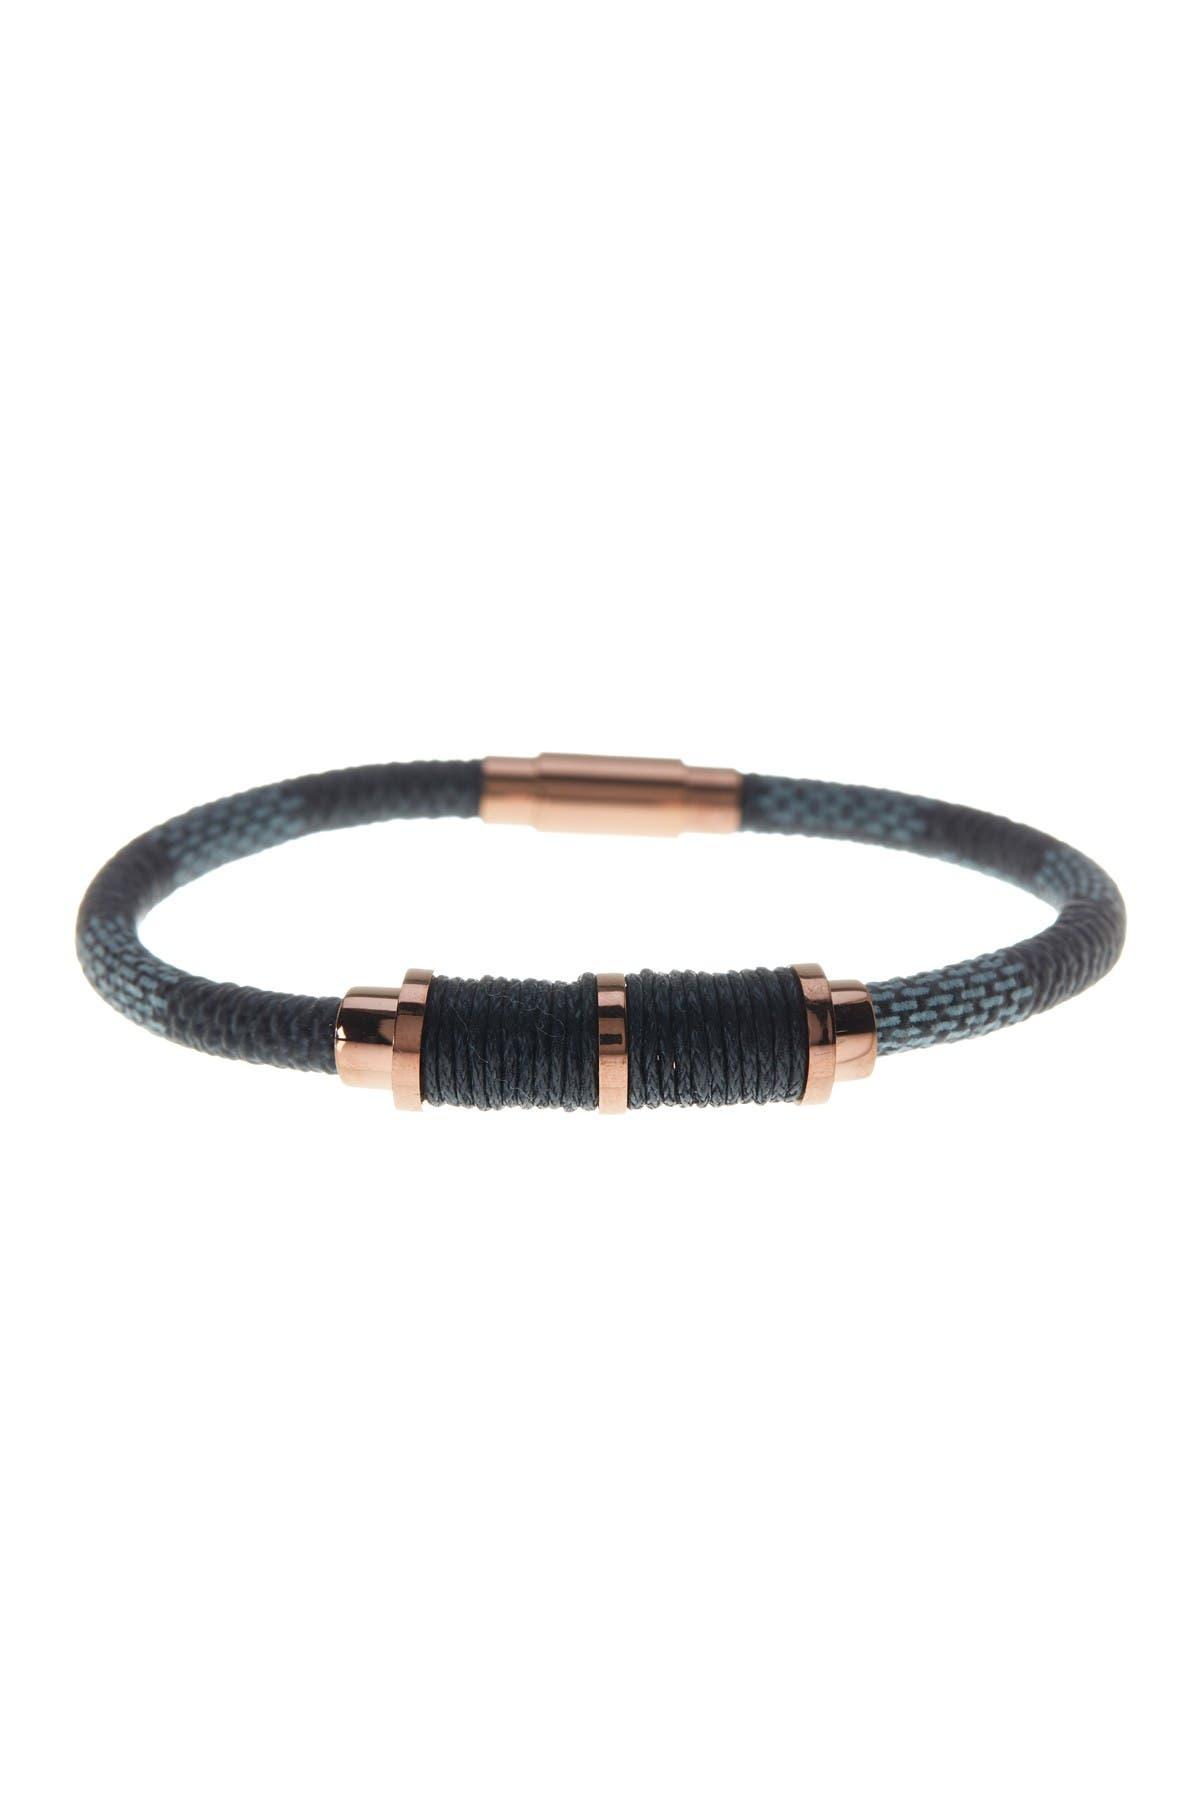 Image of Steve Madden Colorblocked Leather Bracelet